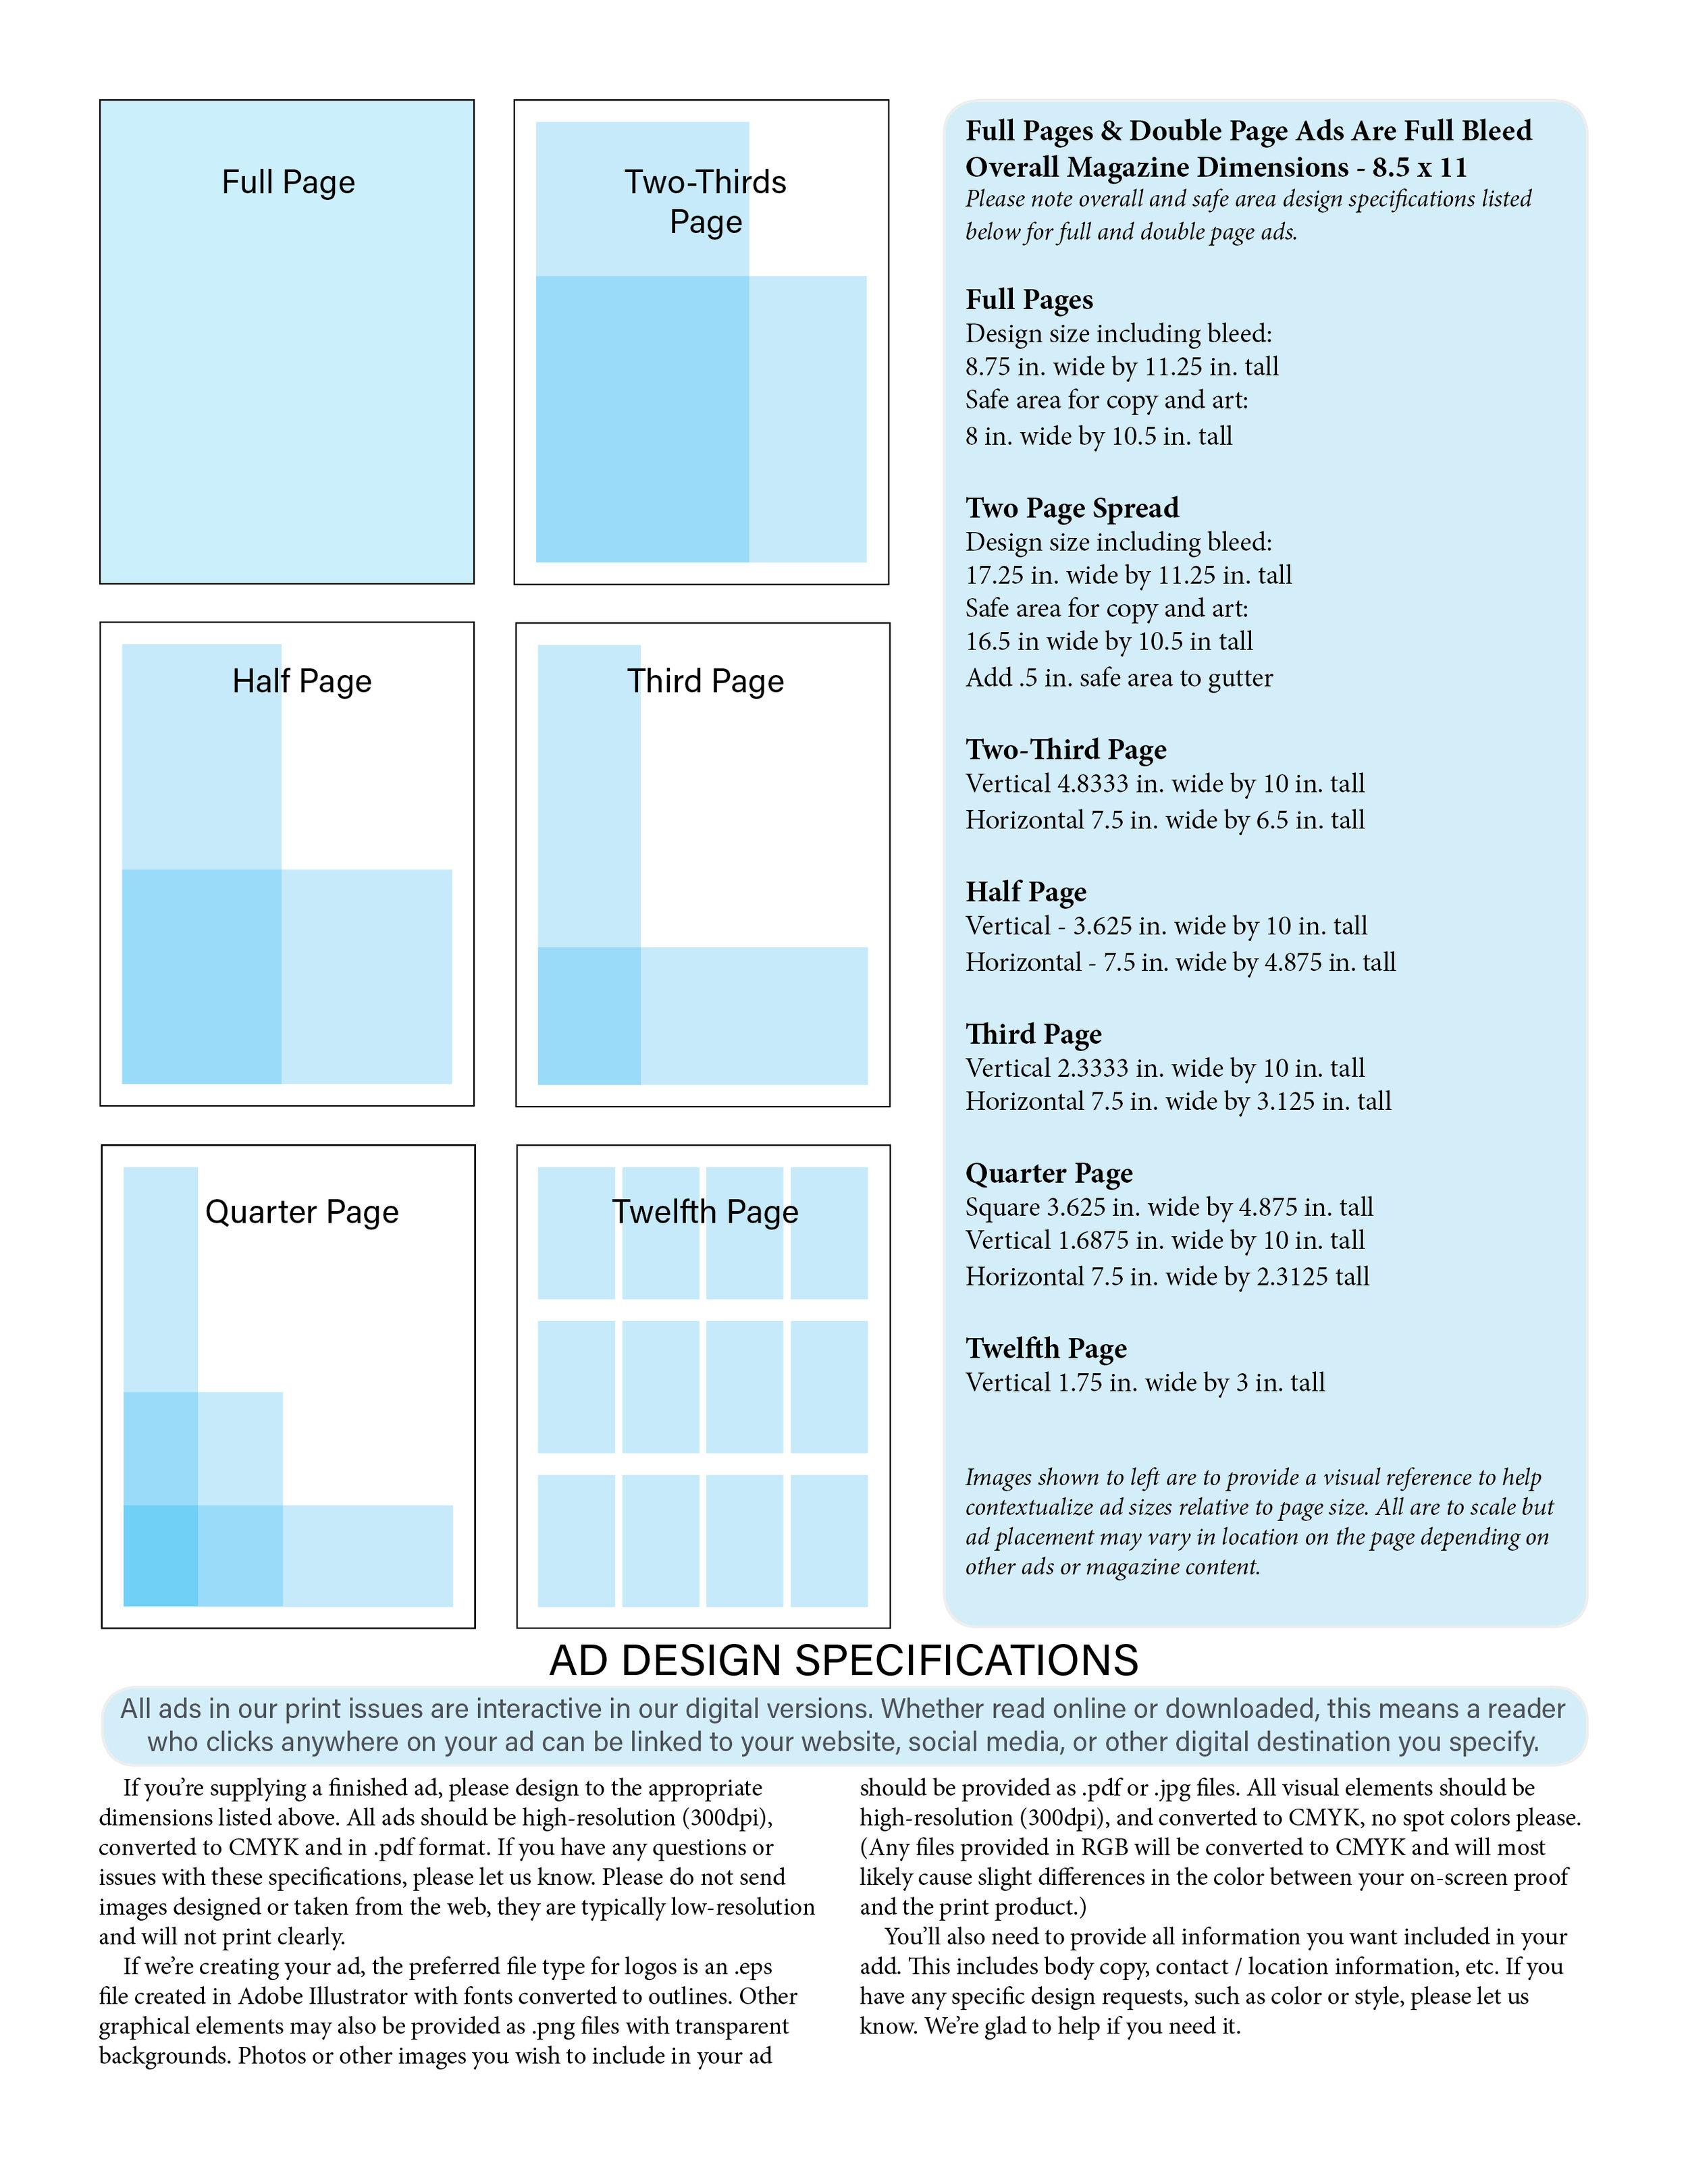 Lake City Magazine Ad Design Specs.jpg